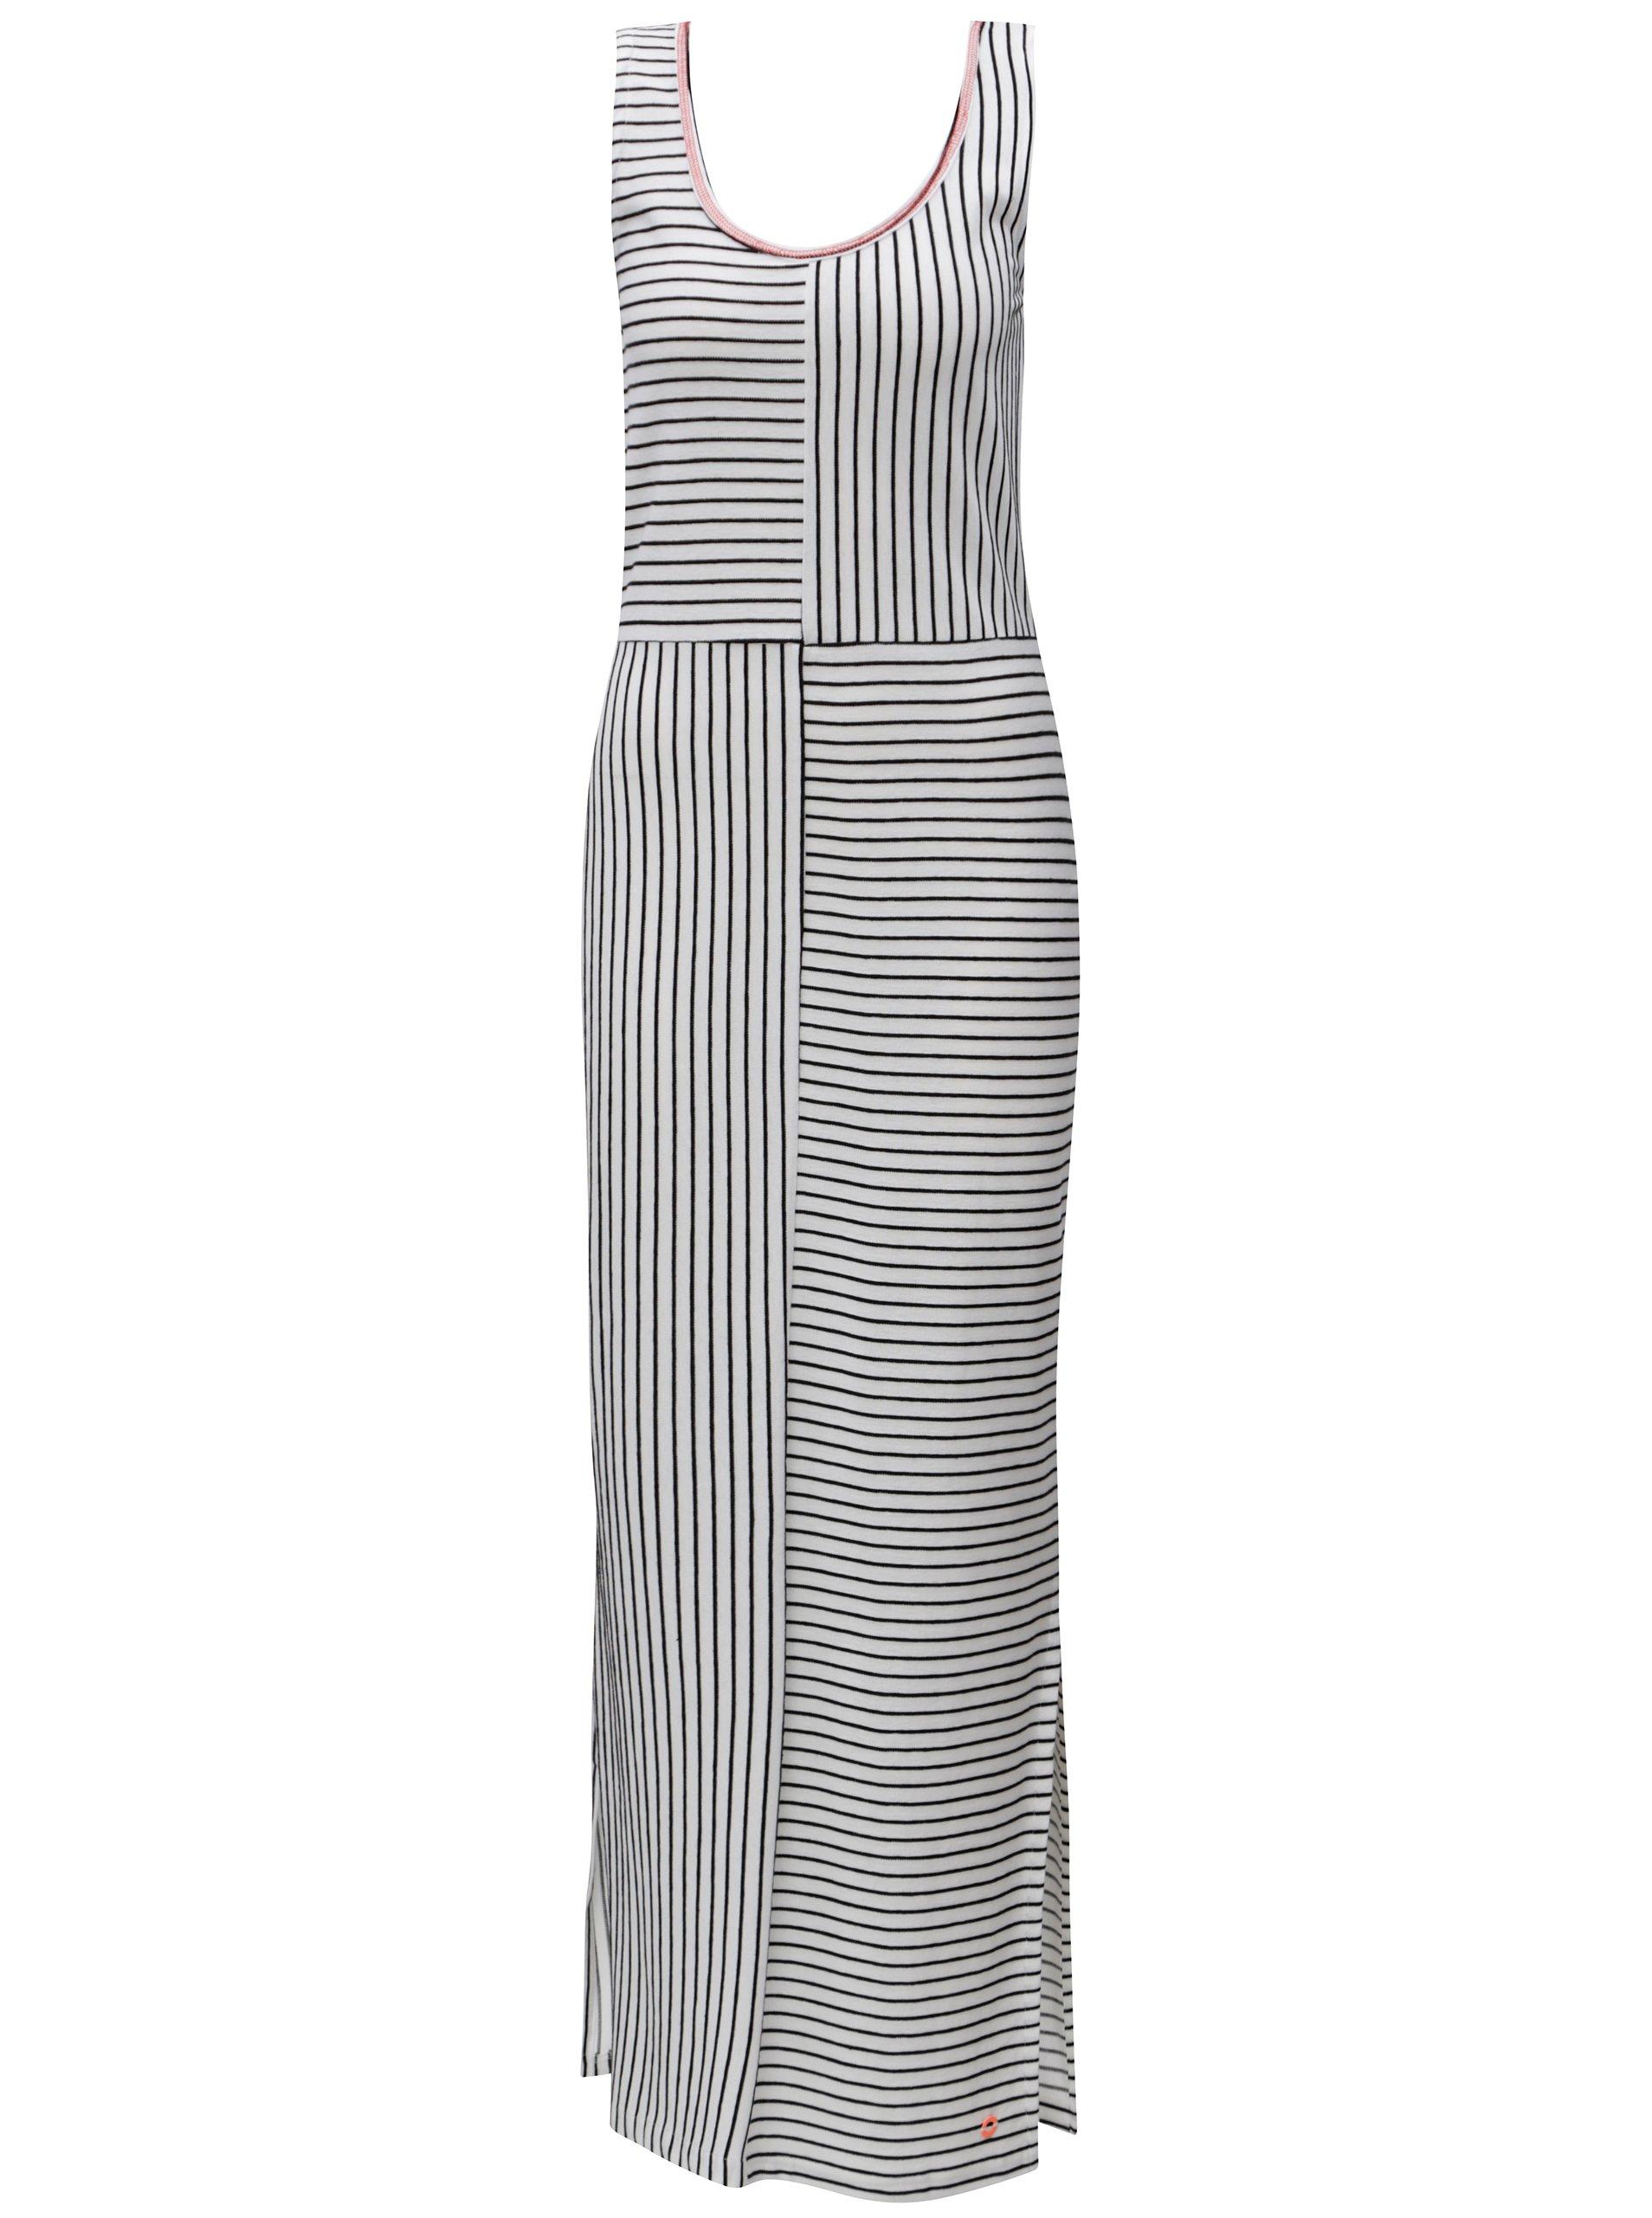 Černo-bílé pruhované maxišaty SKFK